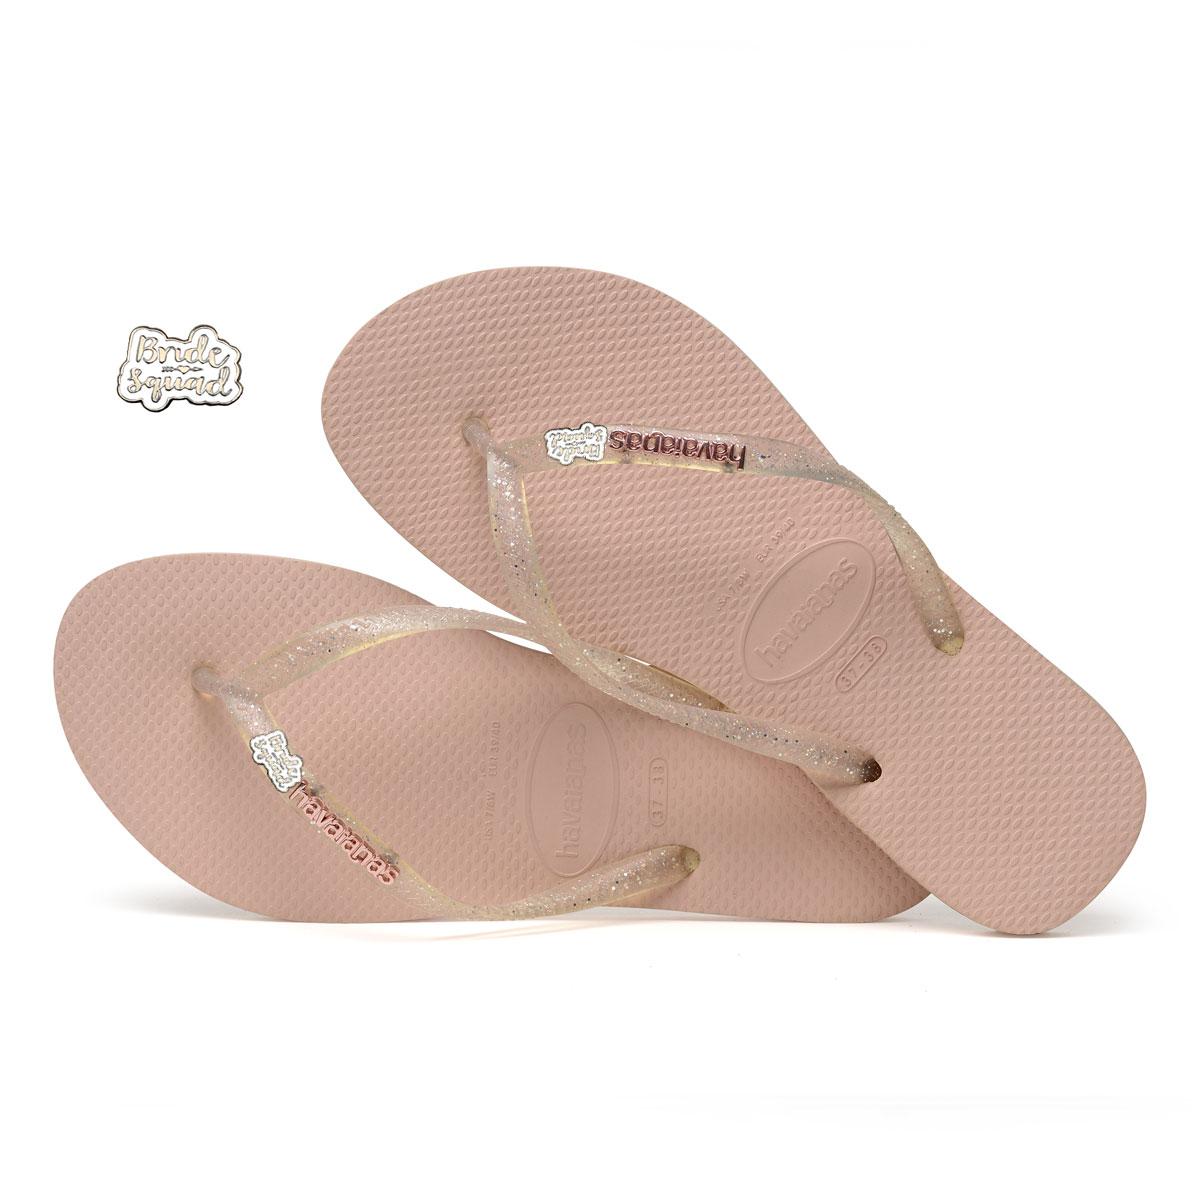 Havaianas Rose Metallic Flip-Flops with Bride Squad Charm